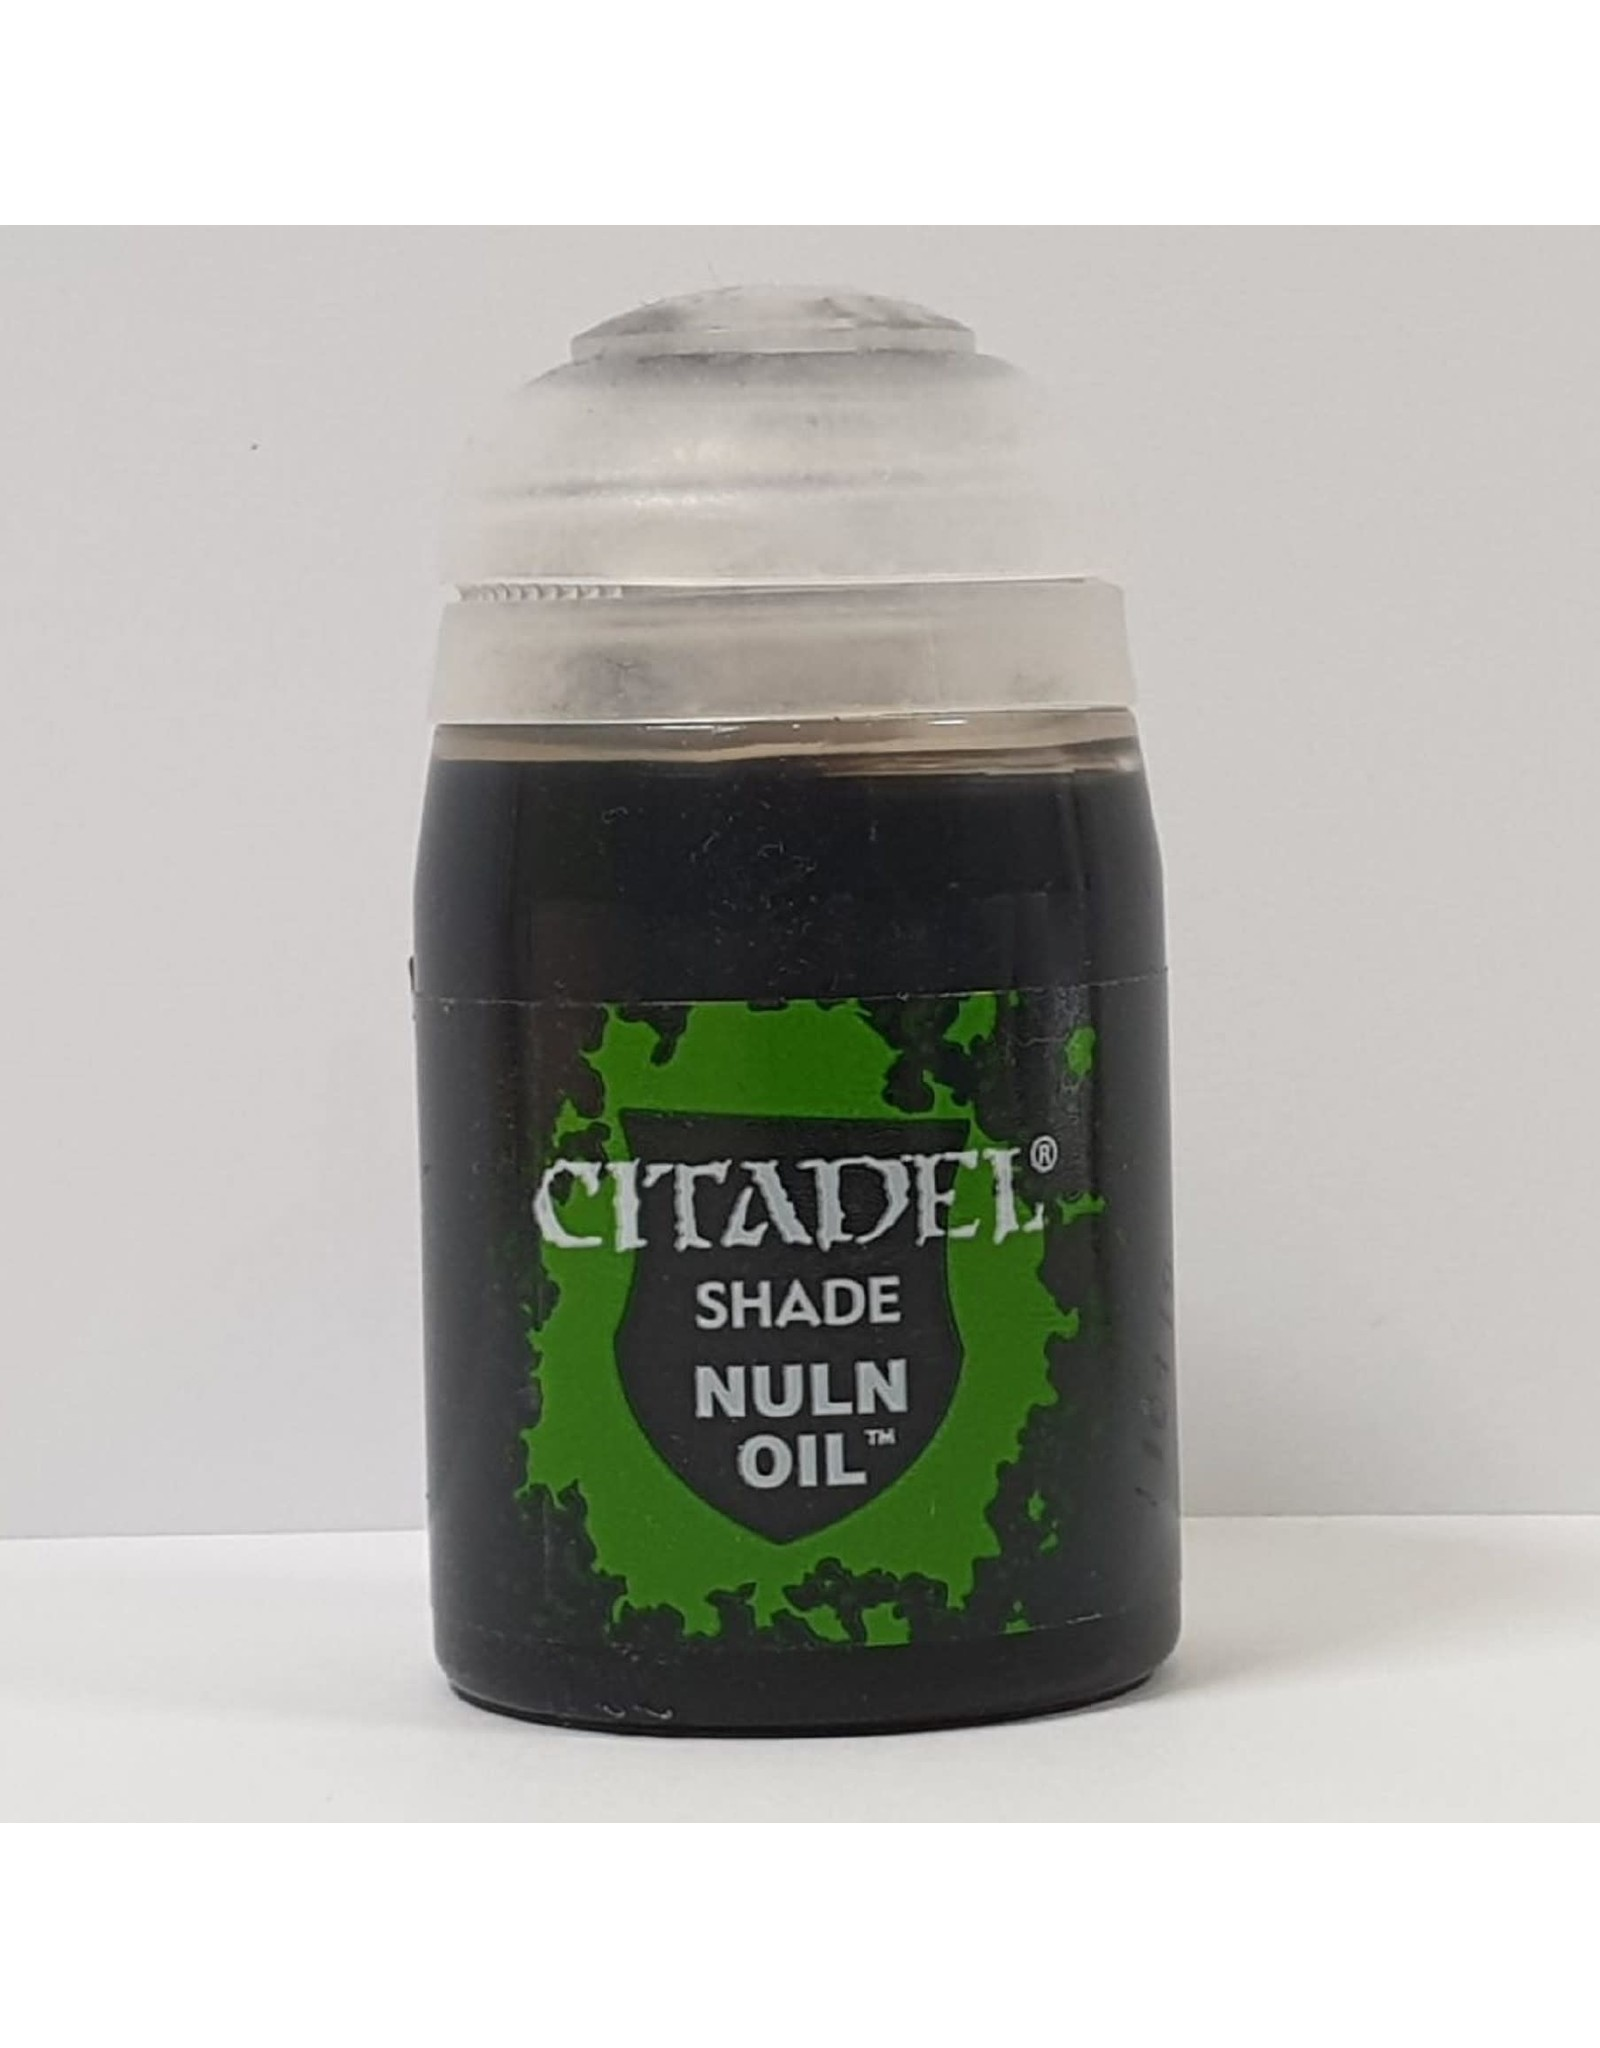 GAMES WORKSHOP CITADEL PAINT SHADE NULN OIL (24ML)